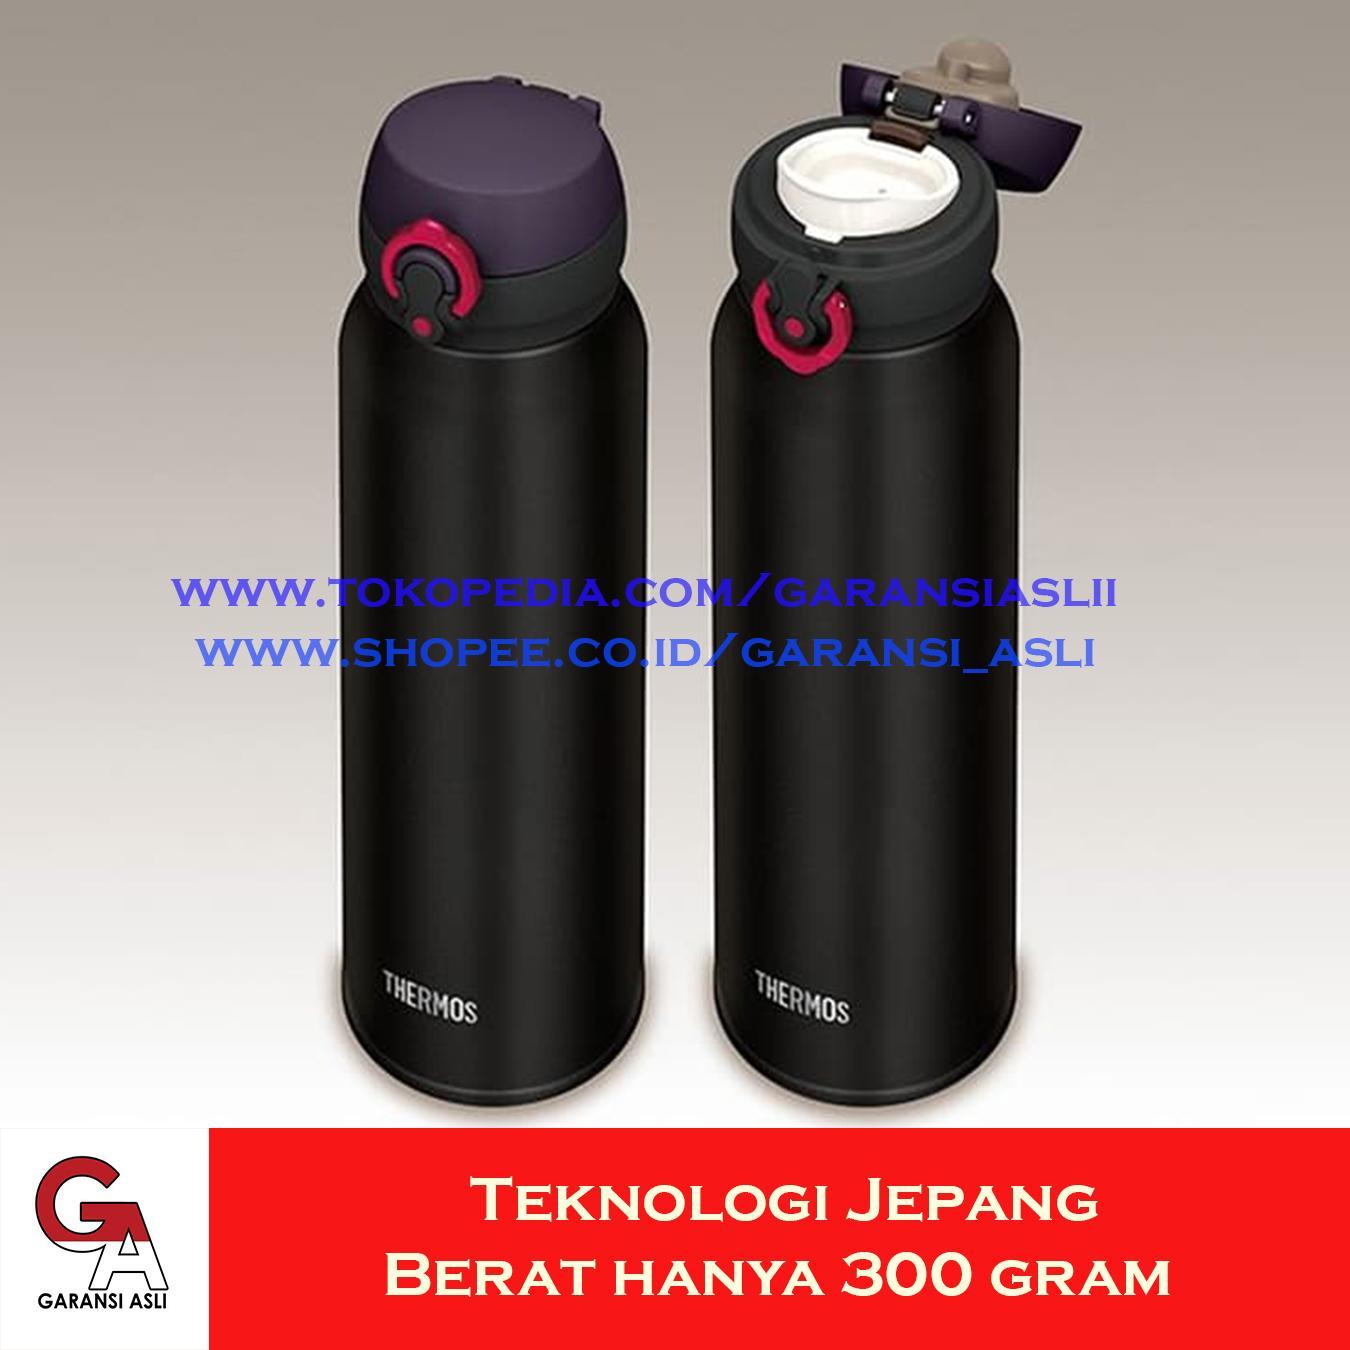 Thermos Jnl 752 Mtbk Ultra Light One Push Tumbler 075l Matte Black Ice Cold Bottle With Bag S Blue 300ml Fhl 400f Sky Matt 750ml